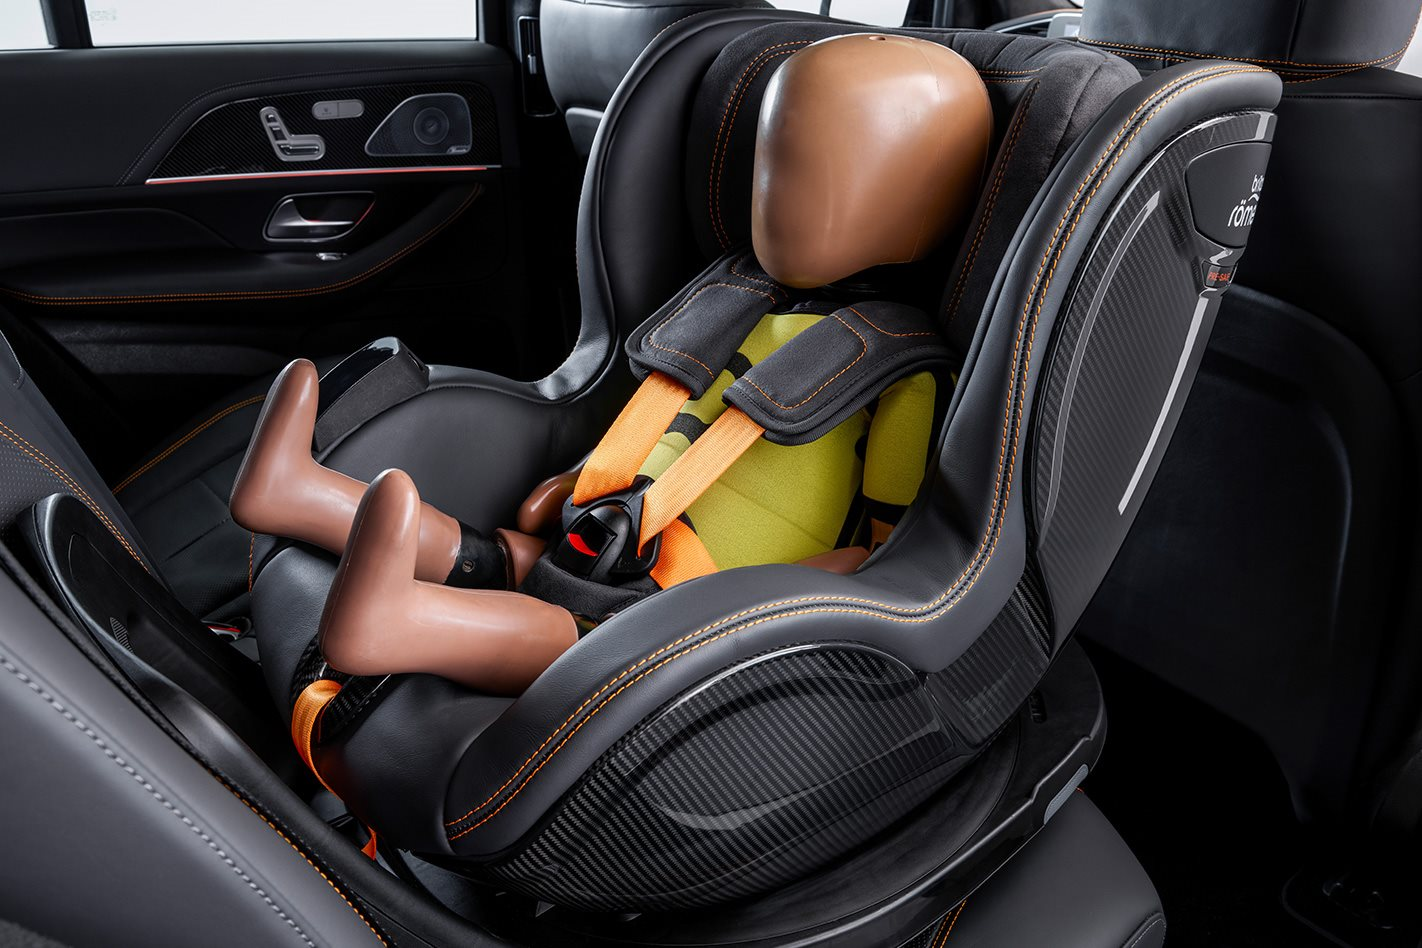 mercedes benz creates world s coolest baby car seat. Black Bedroom Furniture Sets. Home Design Ideas